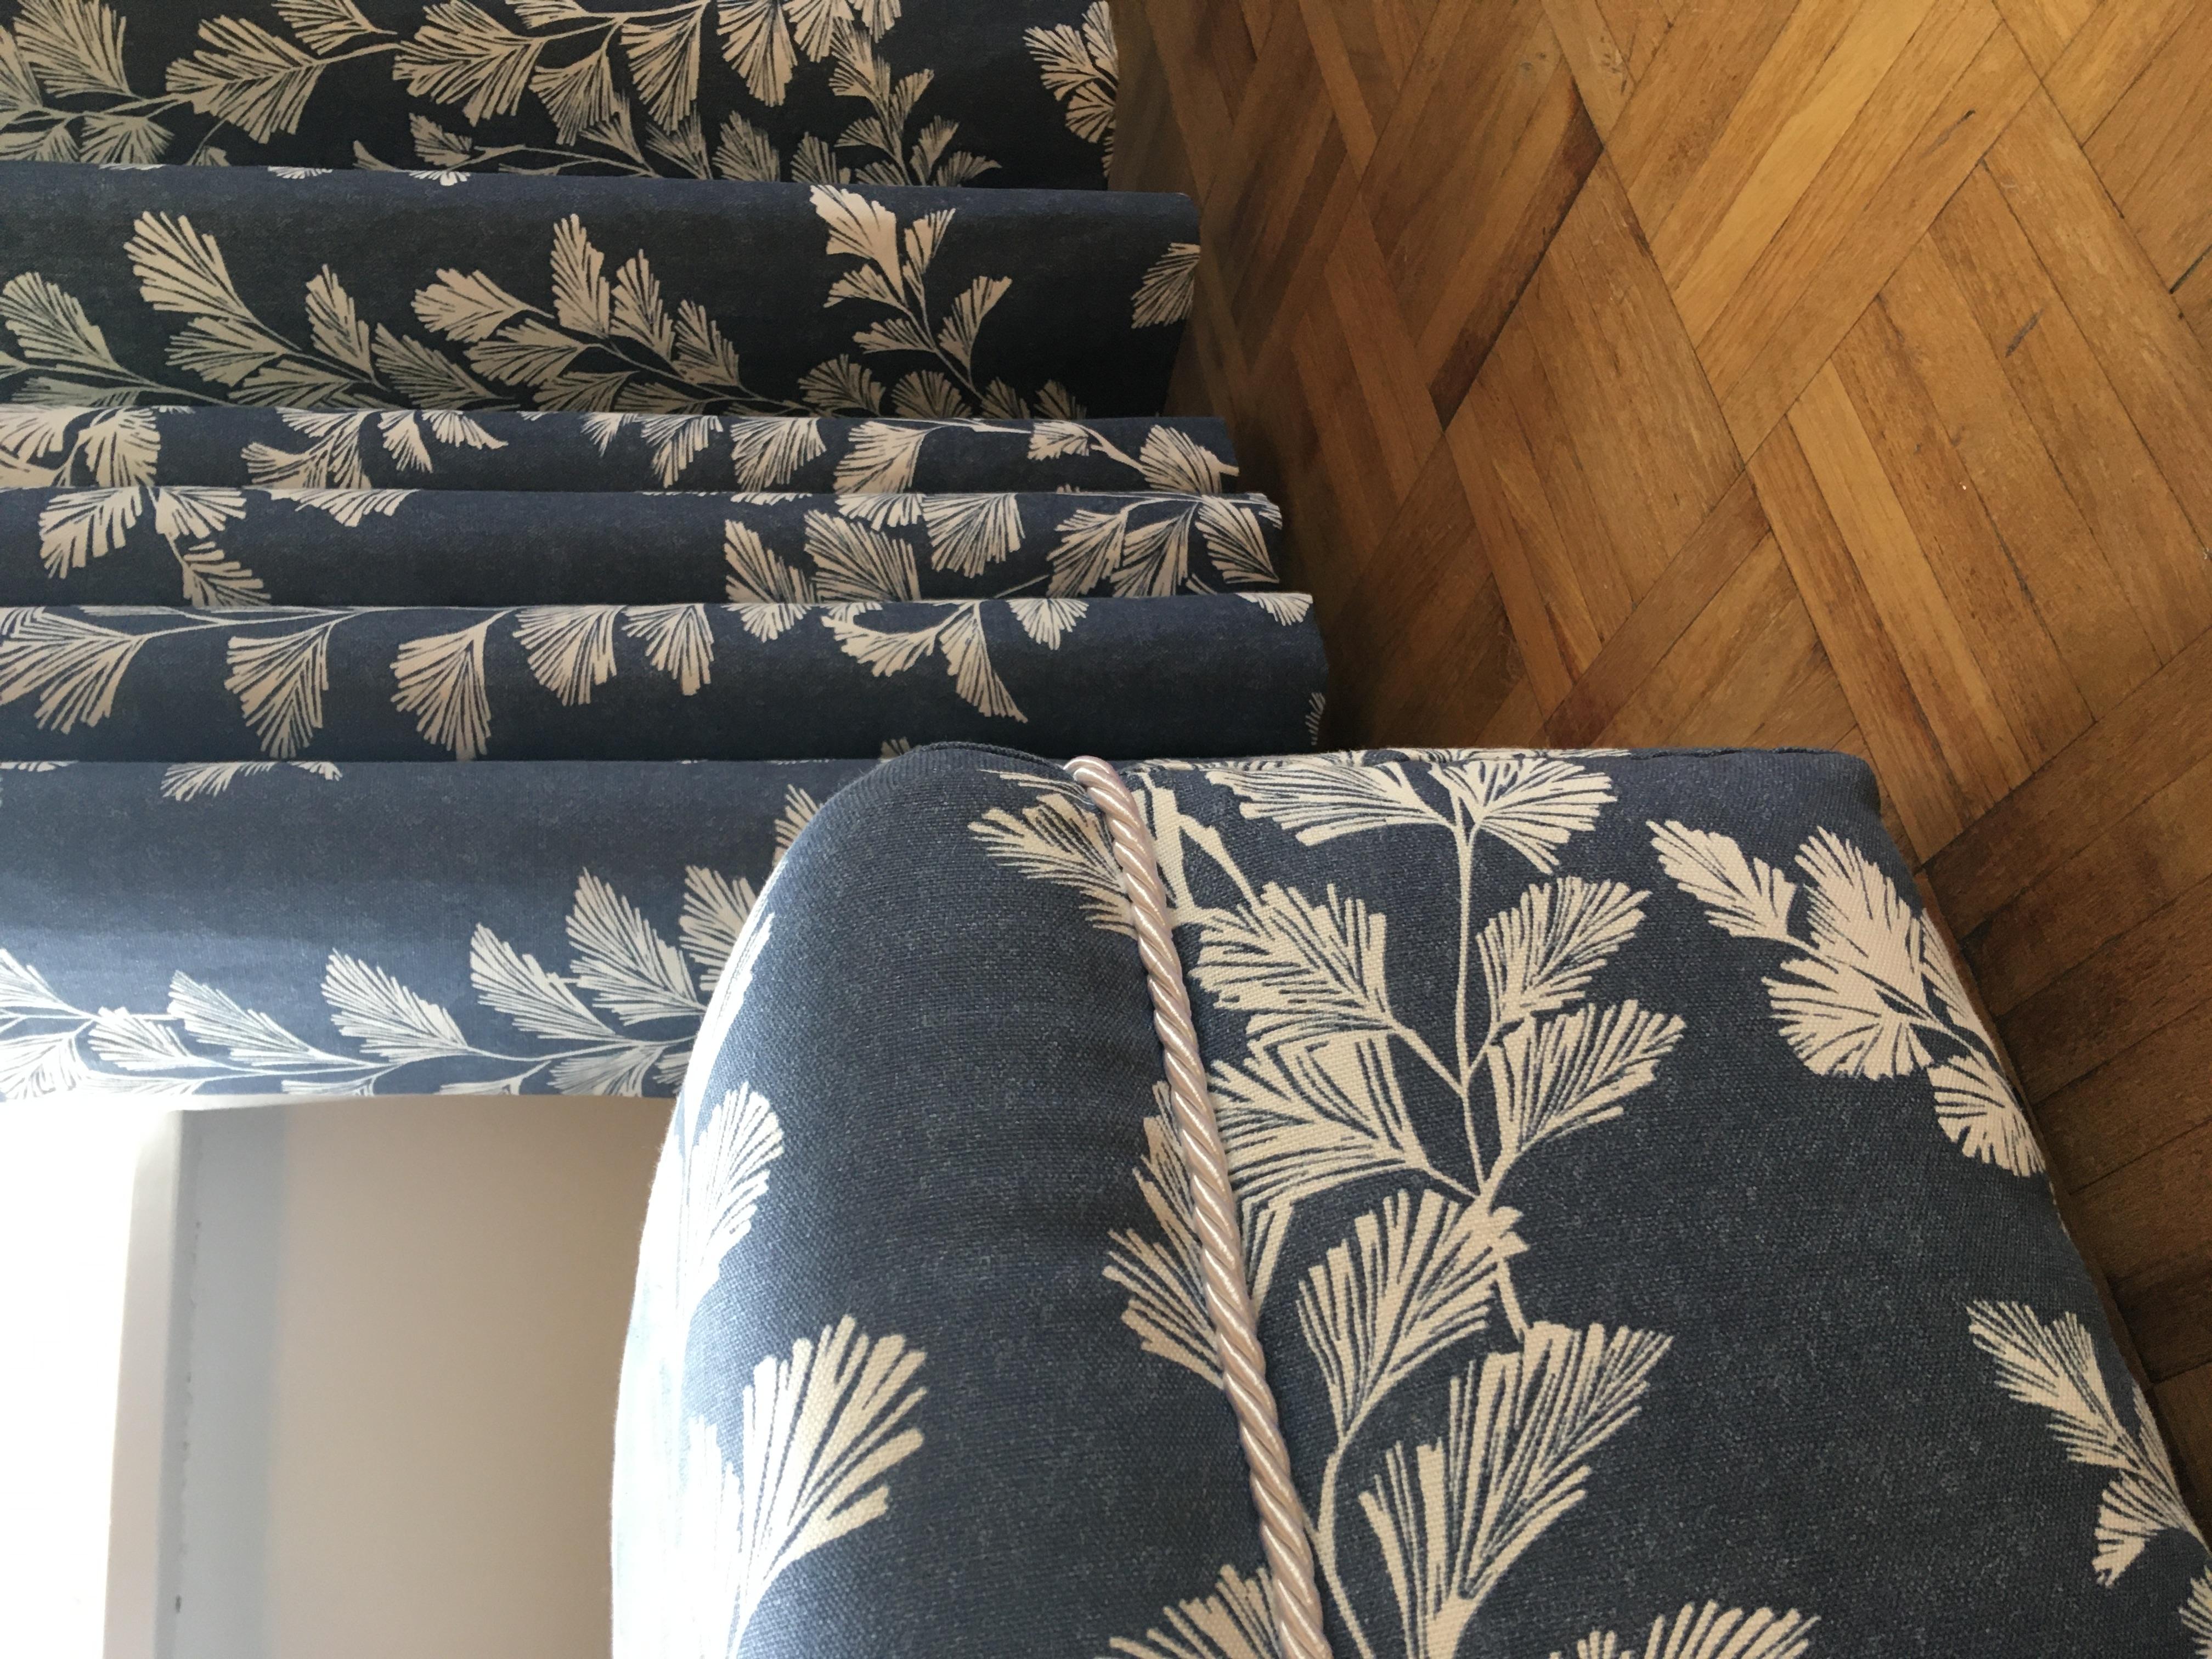 Bespoke midi-sized footstool